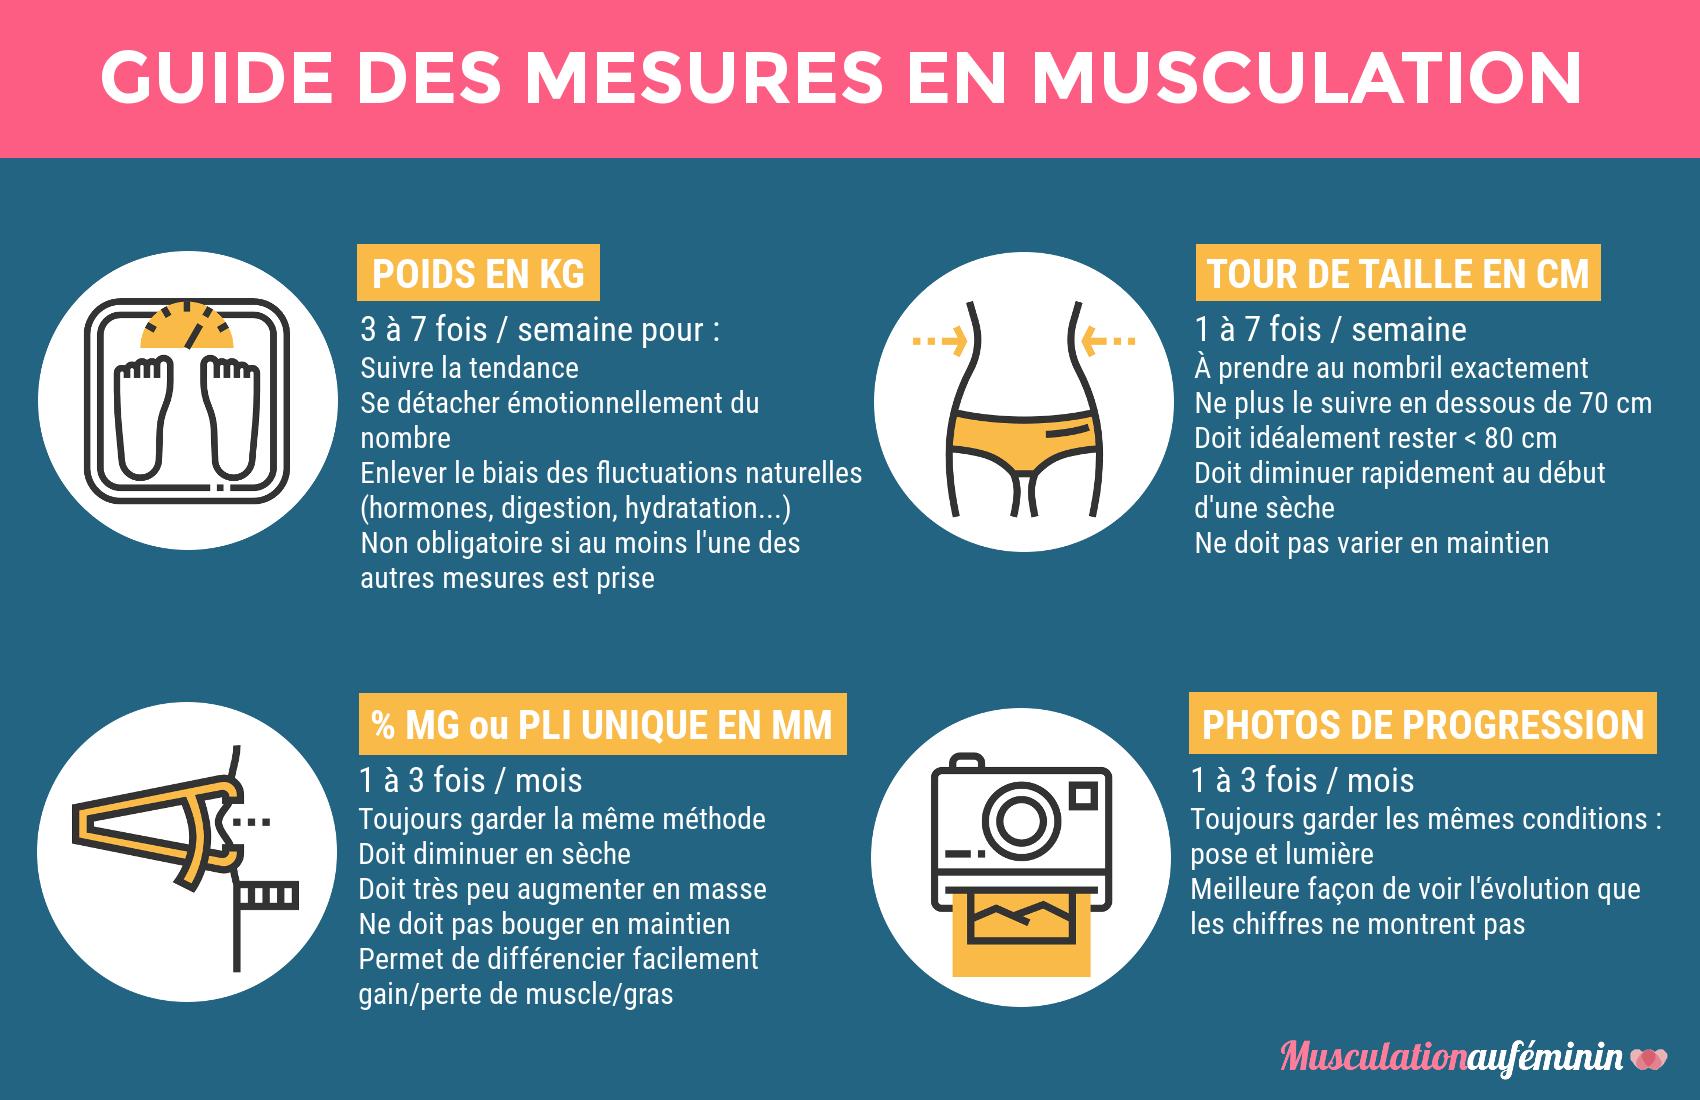 Musculation au f minin programmes conseils et outils for Guide musculation